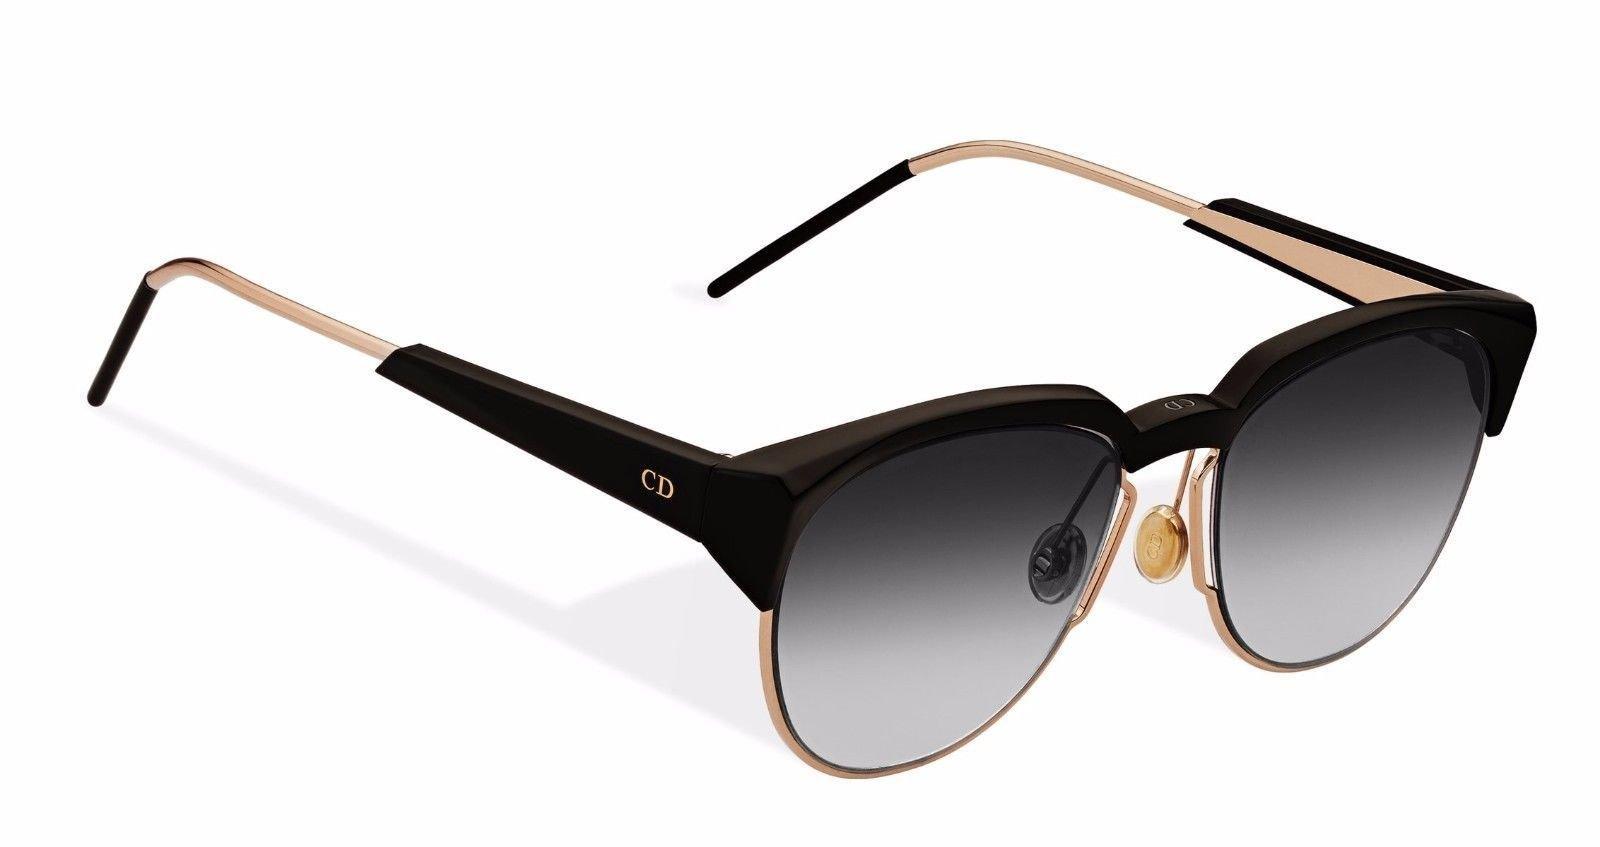 54854b0ef434d New Christian Dior SPECTRAL 01M RO Black Grey Sunglasses